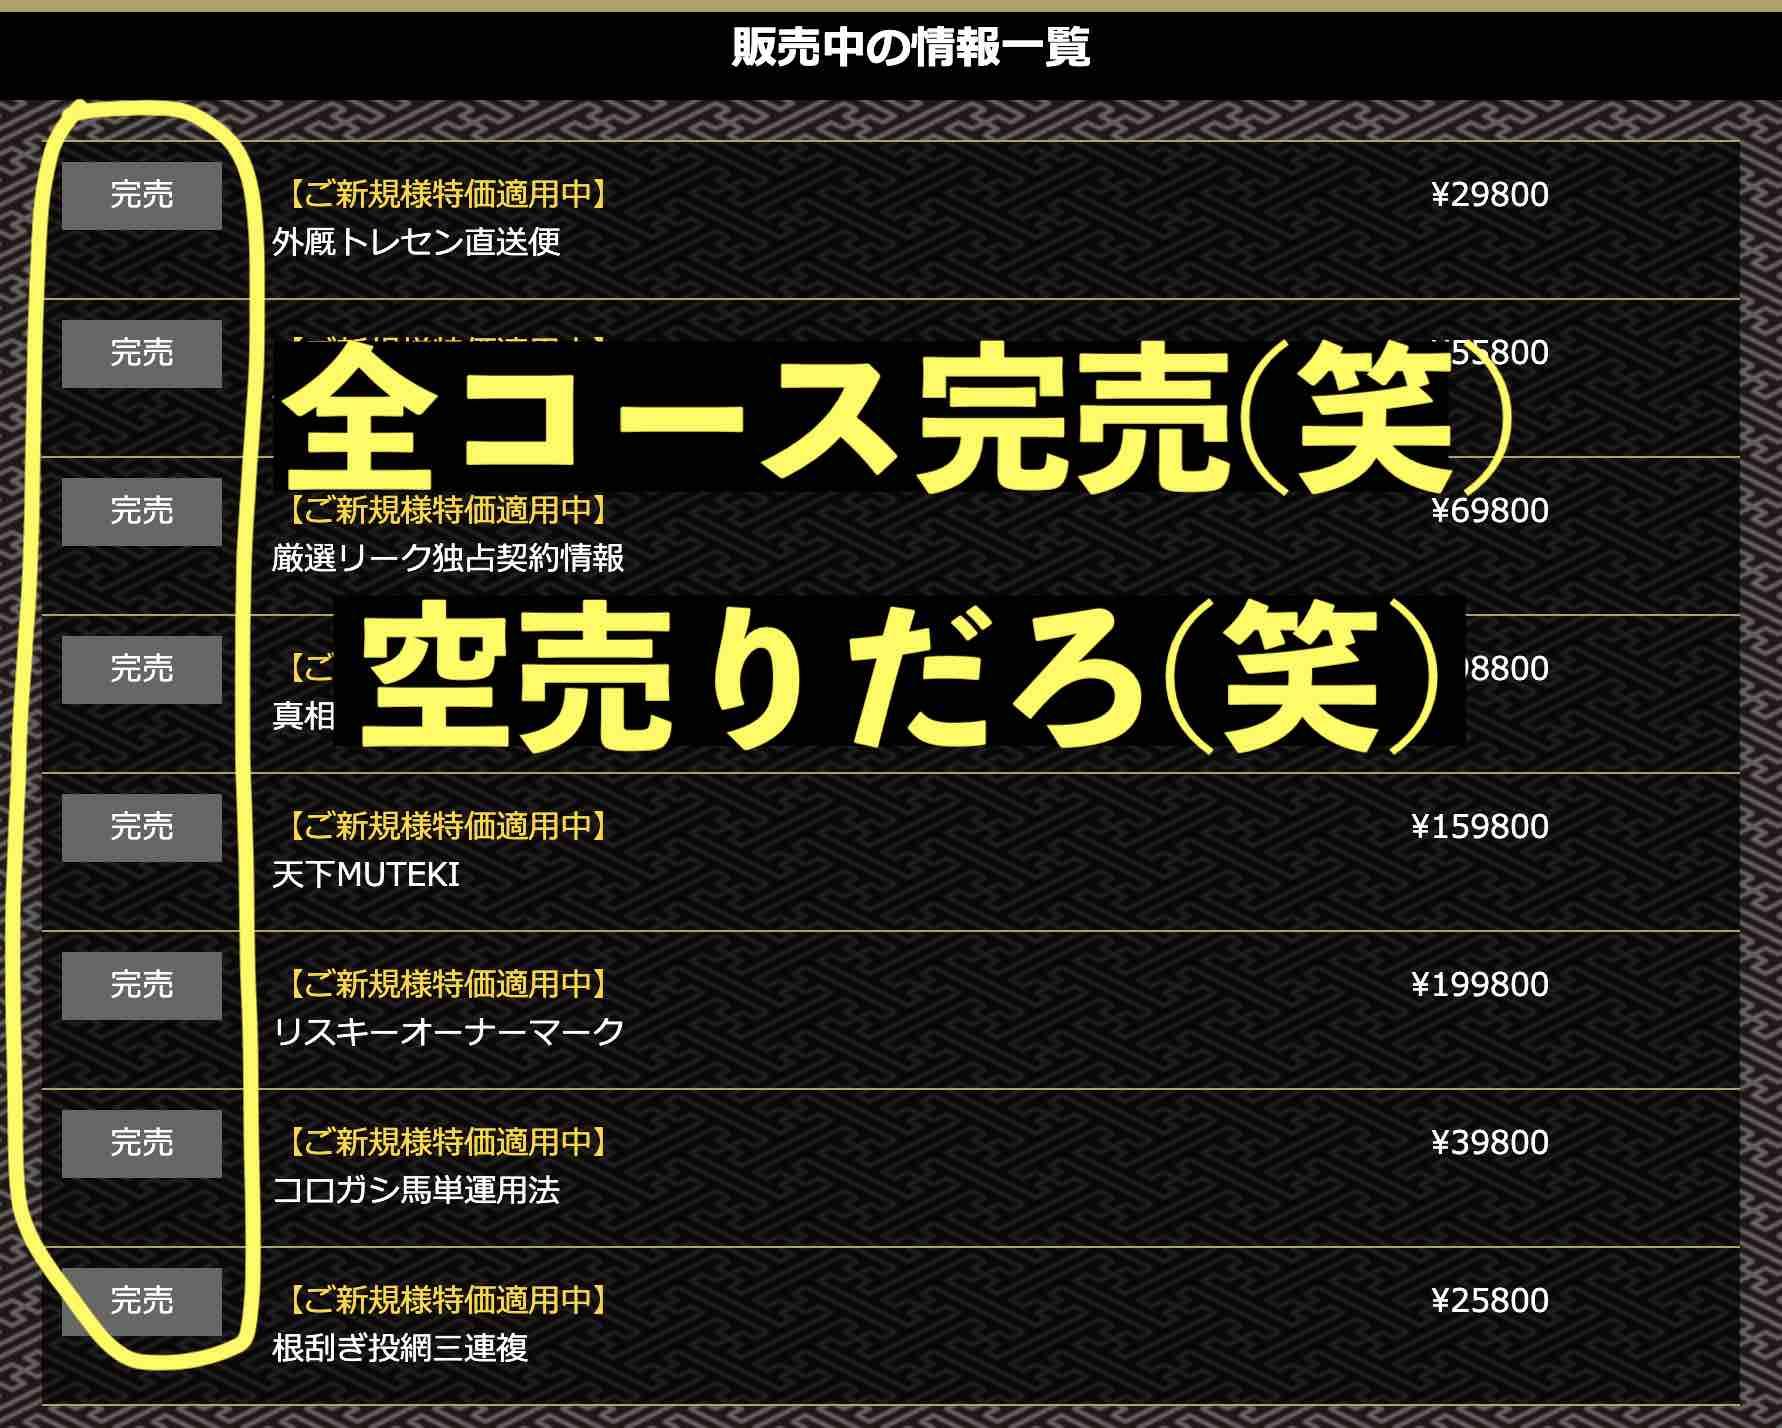 MUTEKIという競馬予想サイトは空売りをして的中を捏造しているようだ